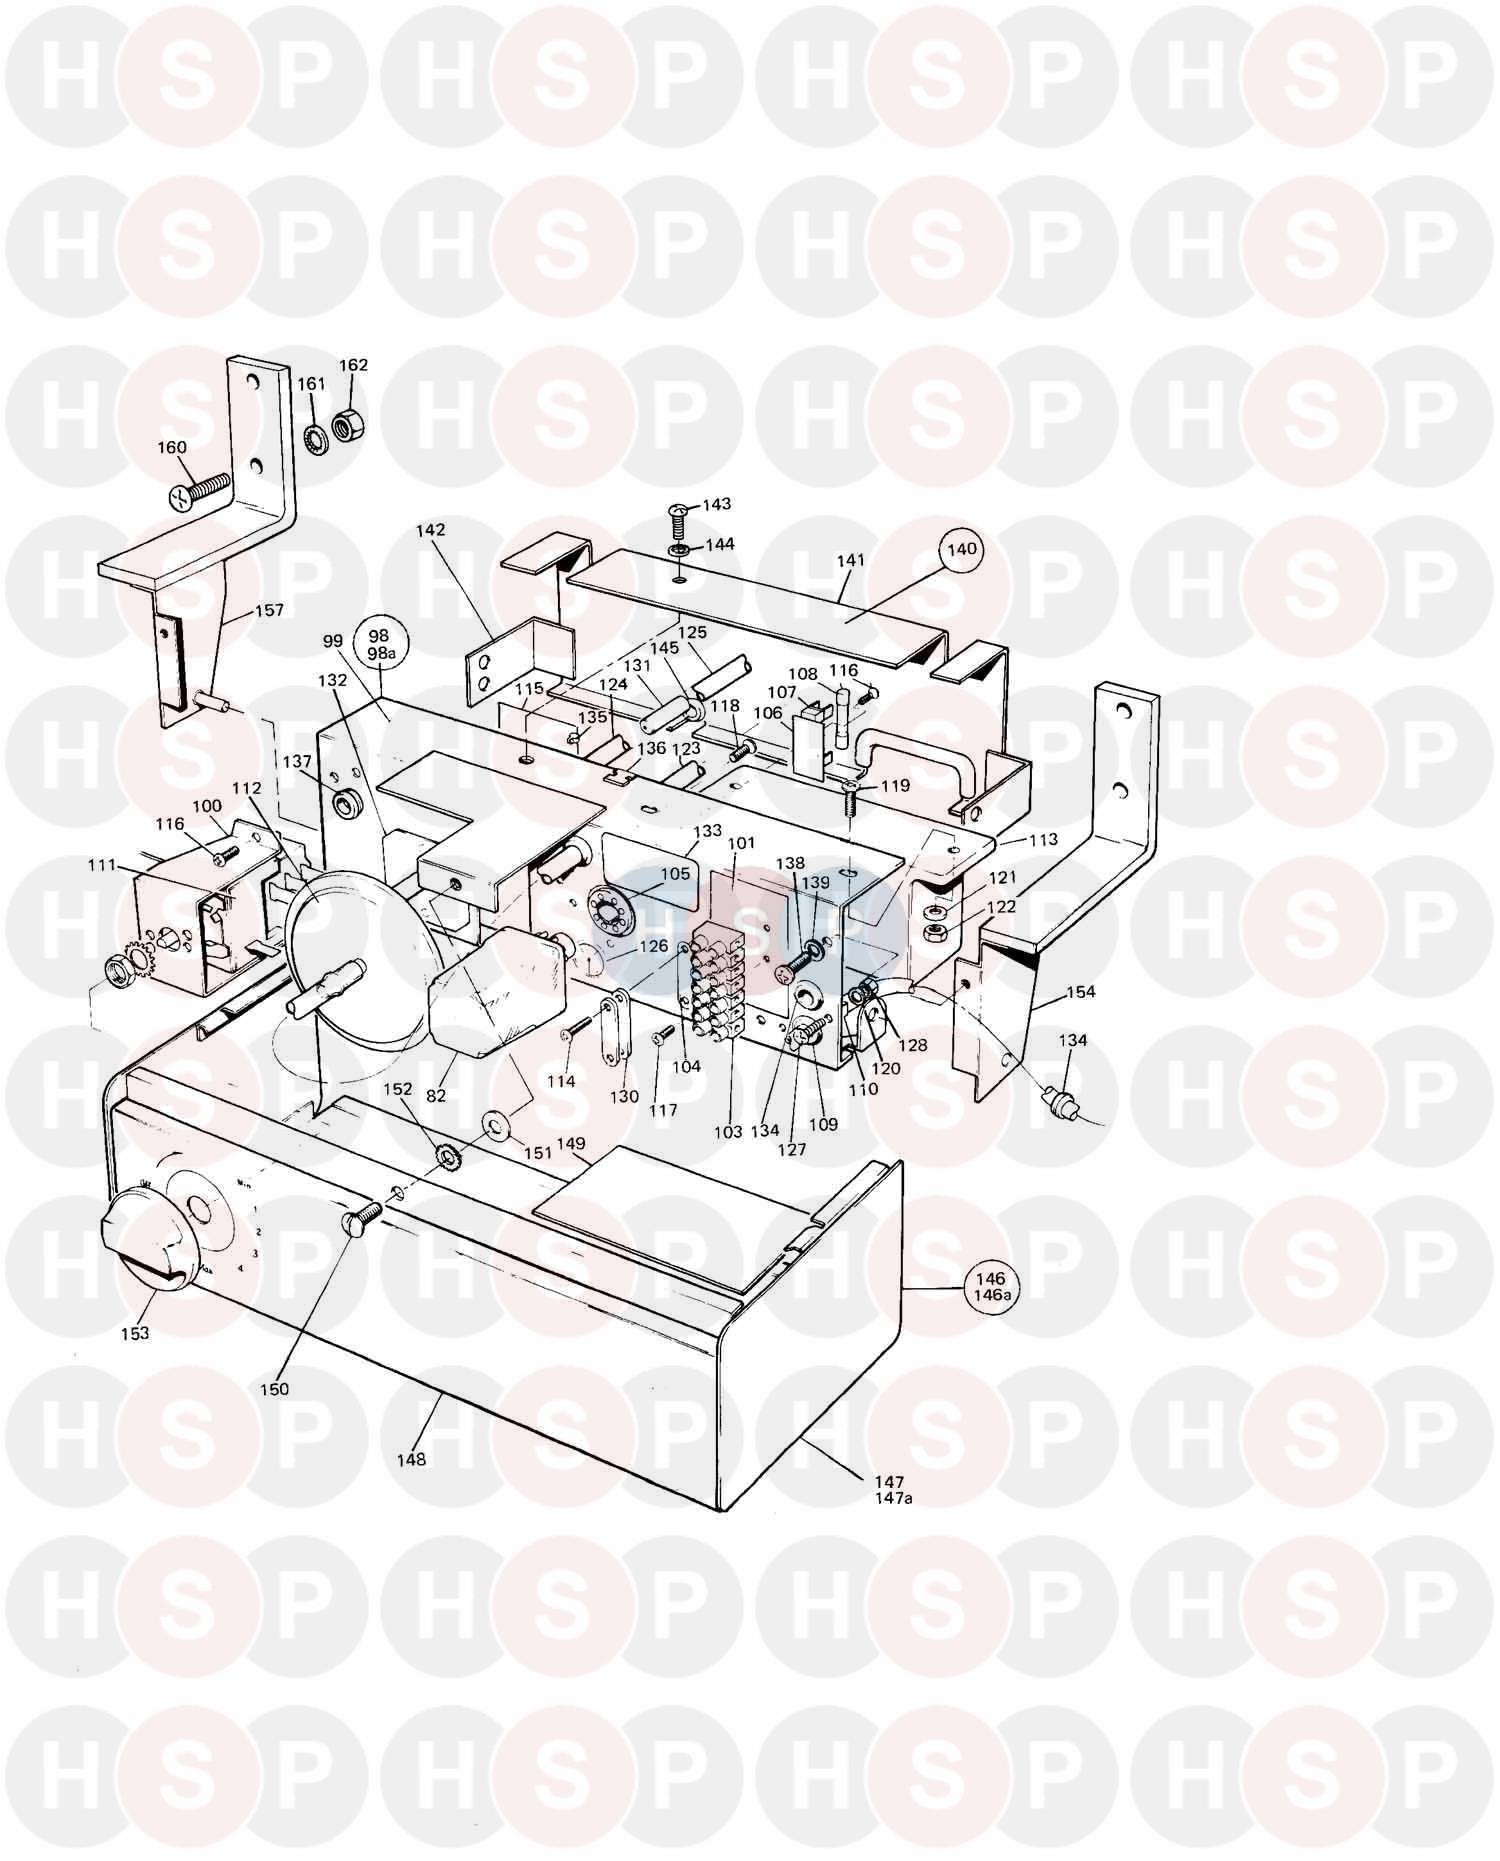 Potterton NETAHEAT MK 2 16/22 (ASSEMBLY 1) Diagram